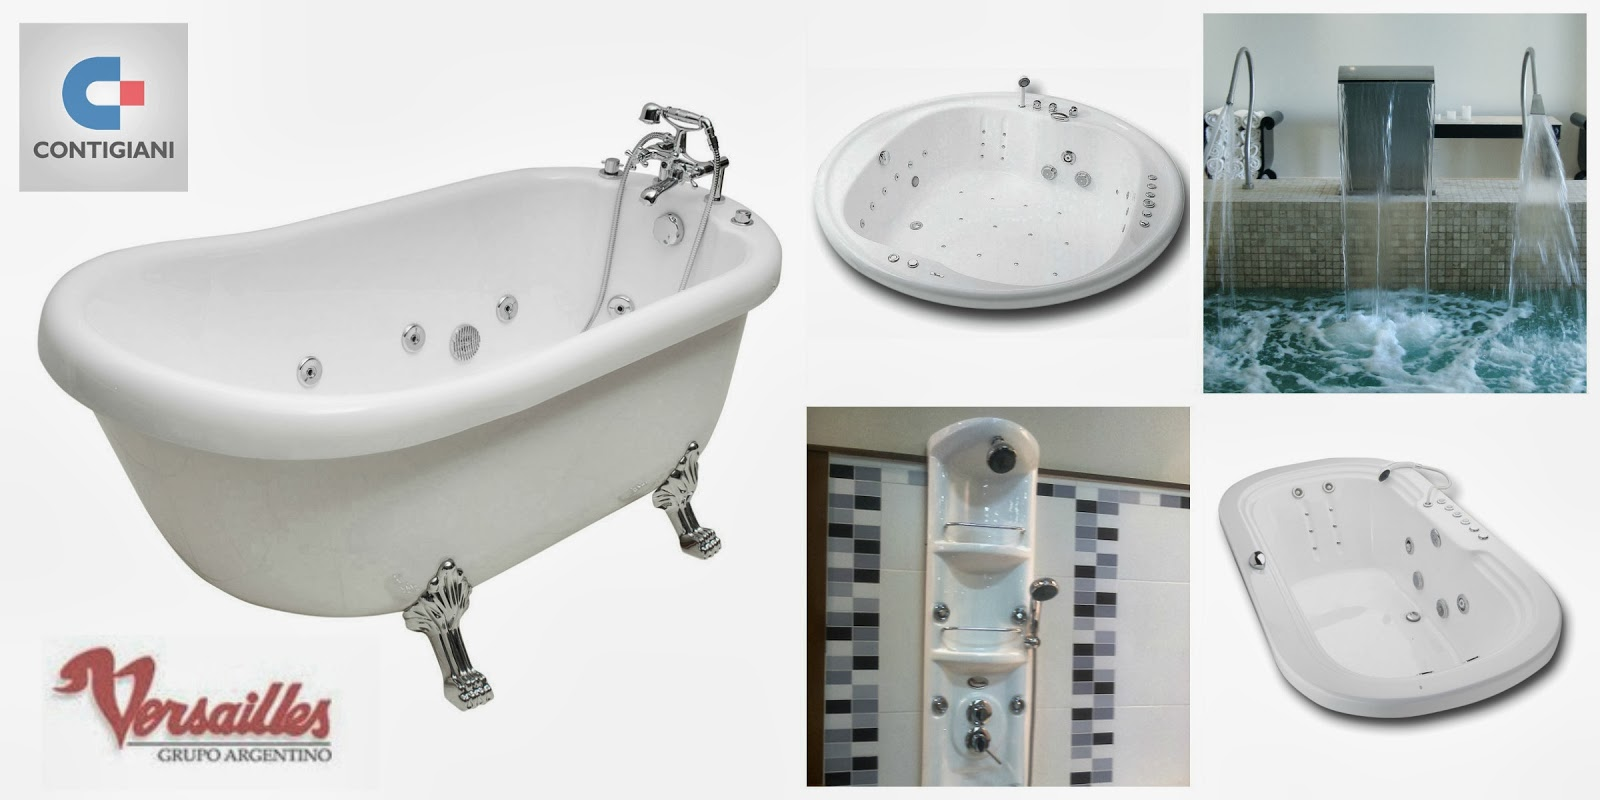 Baño Con Ducha Escocesa:CONTIGIANI: Sistemas de Spa e hidromasajes Versailles